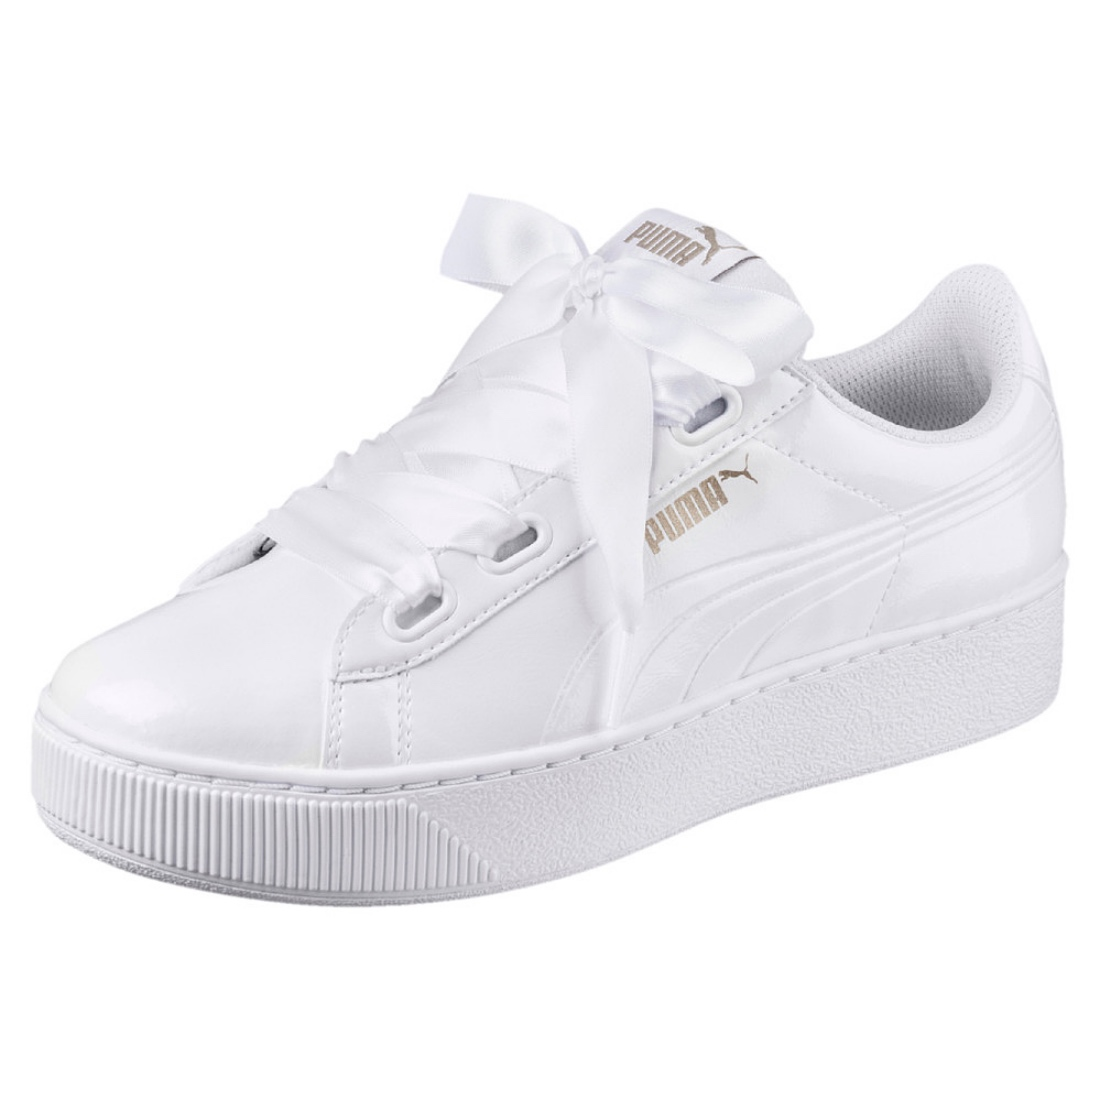 Details zu Puma Vikky Platform Ribbon P Damen Sneaker Schuhe 366419 Weiß  Lack